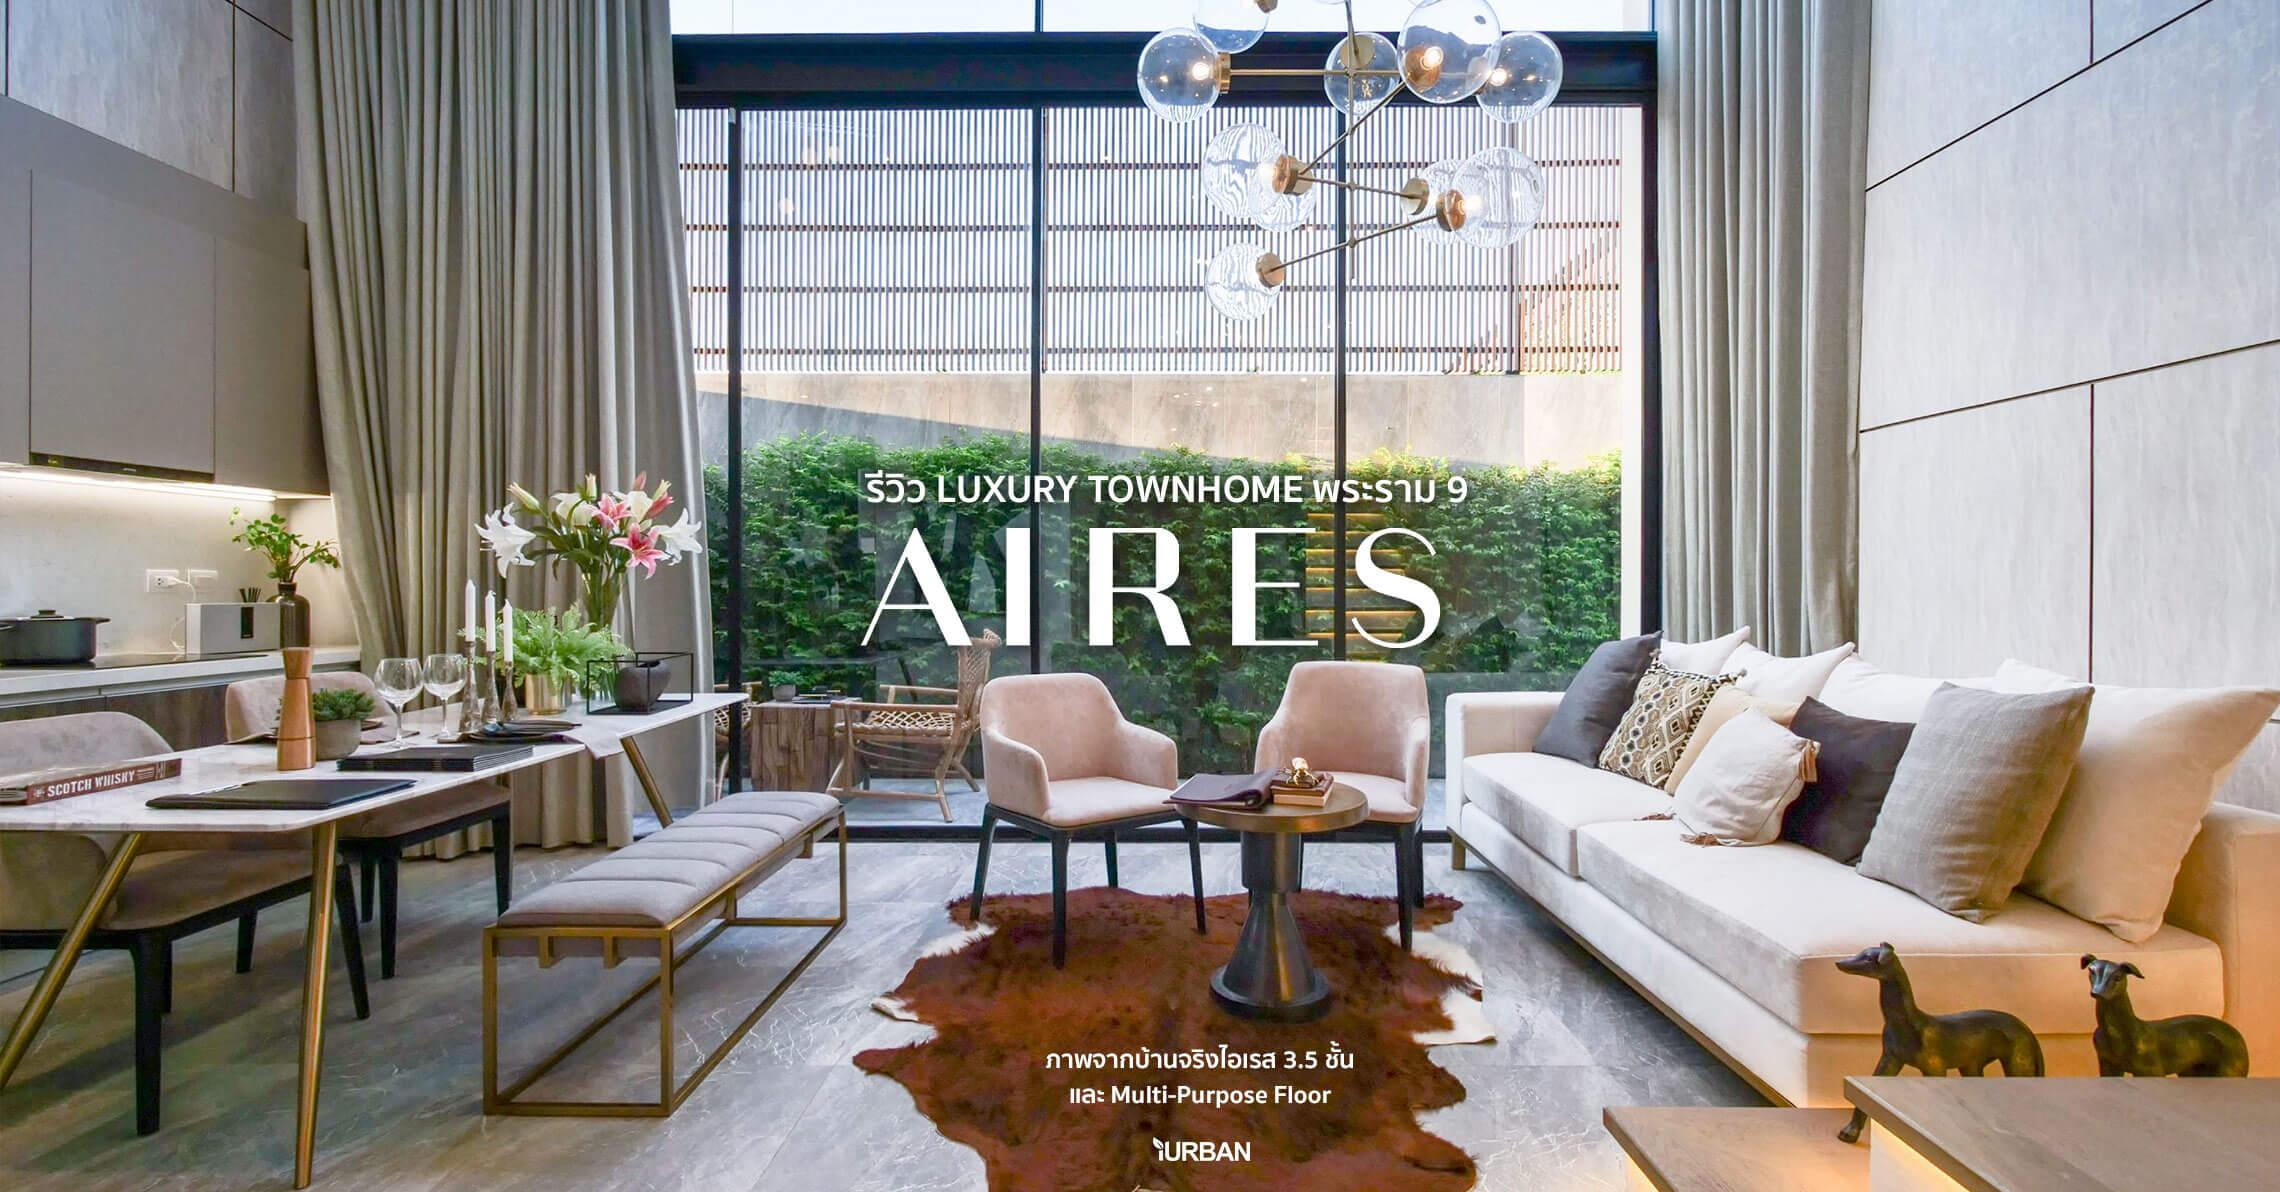 AIRES RAMA9 รีวิว Luxury Townhome 3.5 ชั้น + Rooftop ออกแบบสวย ย่านพระราม9 (ใกล้ รพ.สมิติเวช) 4 - AIRES